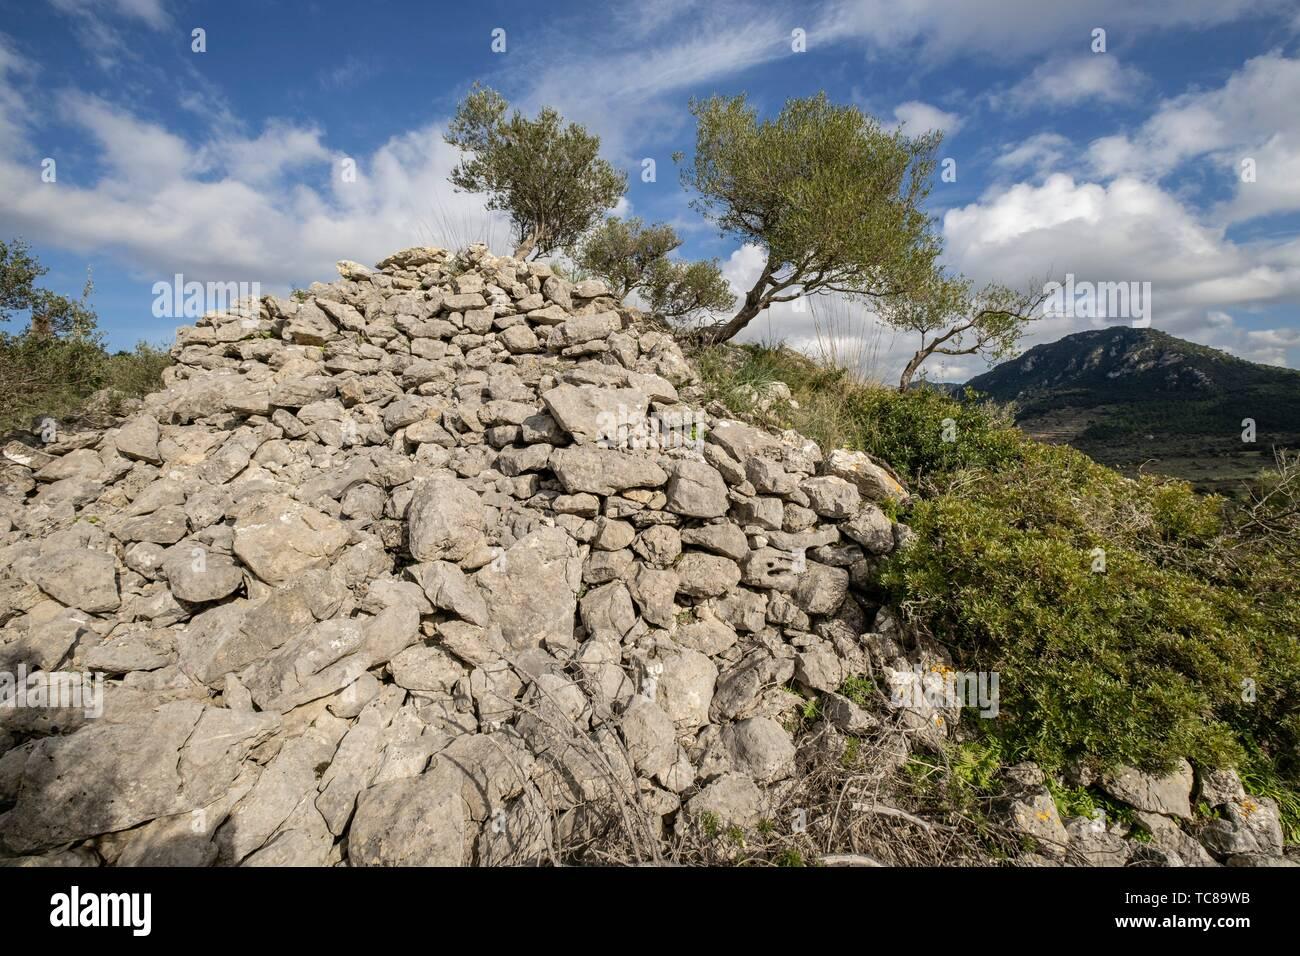 túmulo de Son Ferrandell-Son Oleza, I milenio a C. , Valldemossa, Mallorca, Balearic islands, spain. - Stock Image